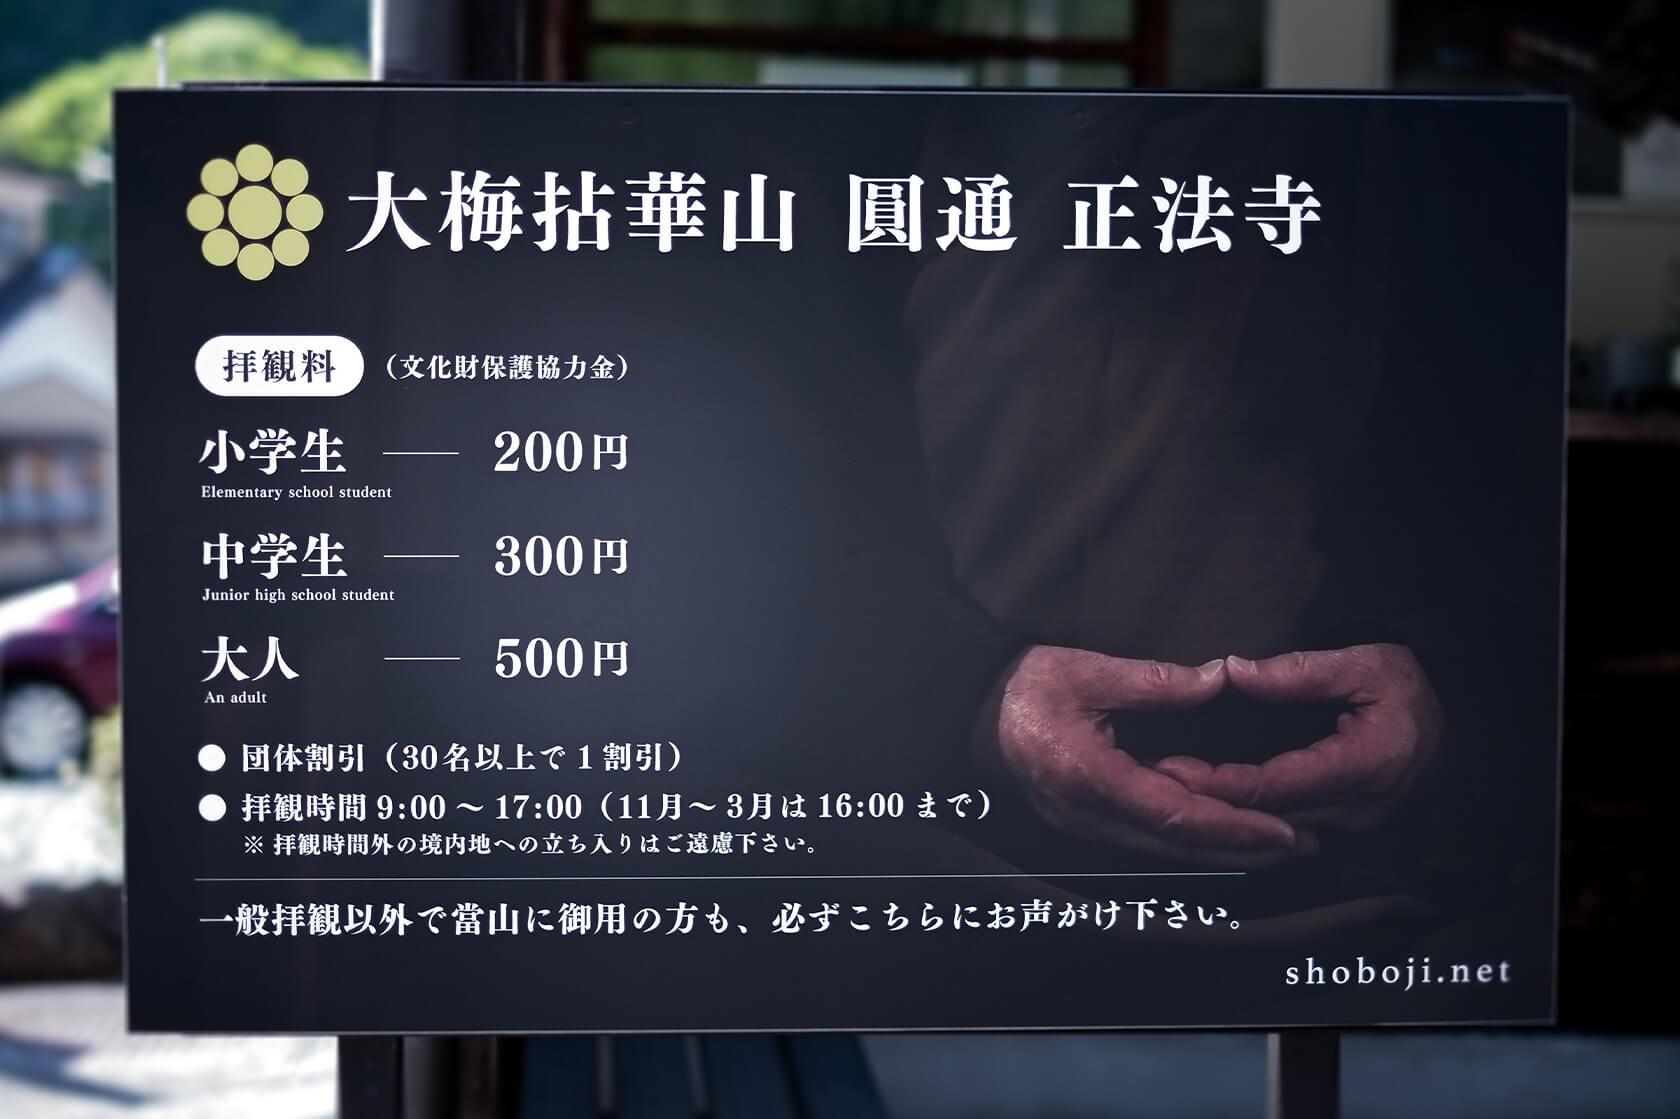 大梅拈華山 圓通 正法寺 / ポスター・冊子・看板制作